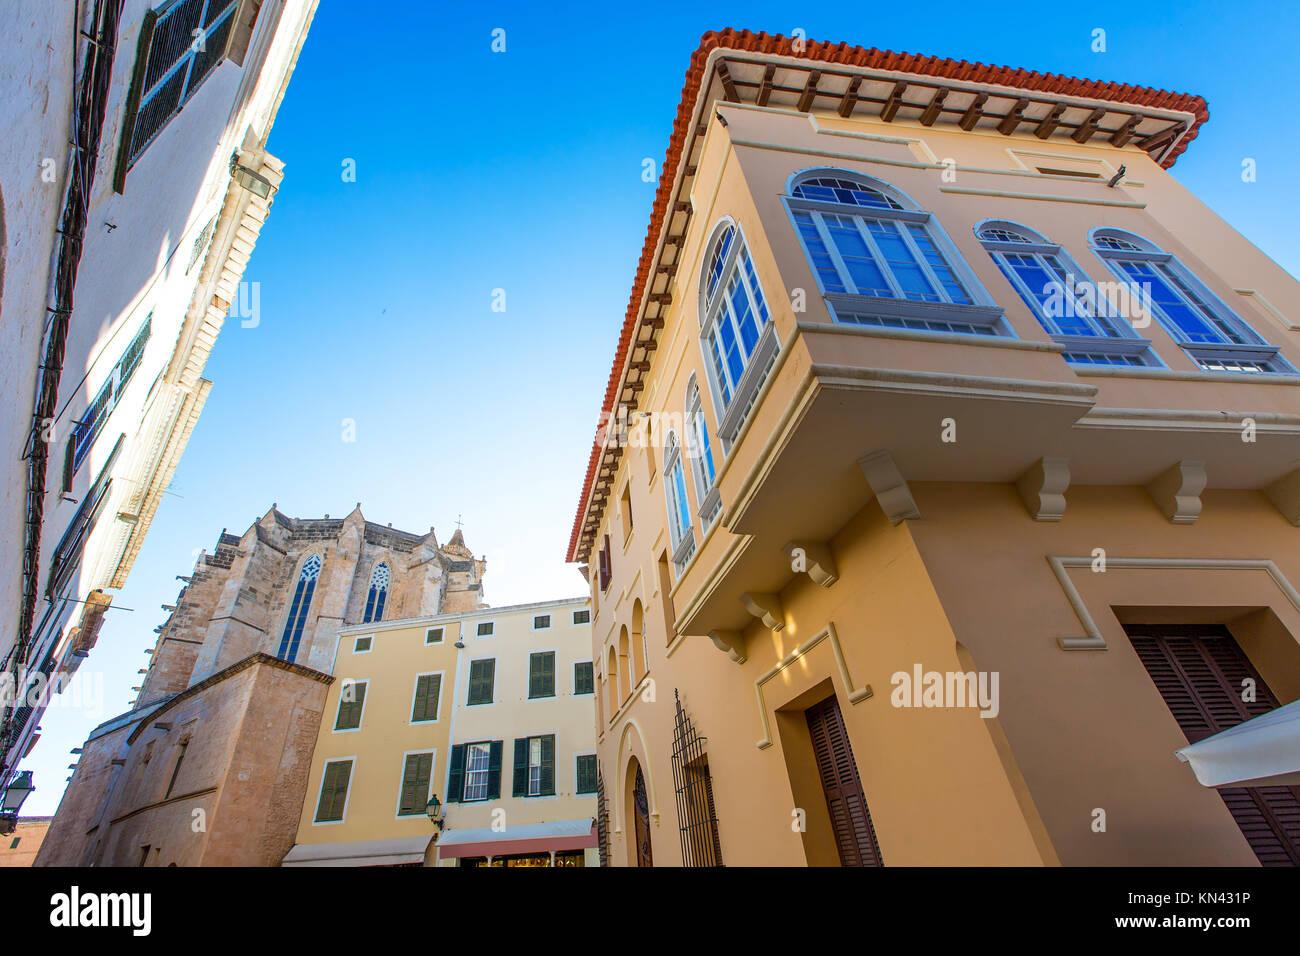 Ciutadella Menorca Cathedral at Ciudadela downtown in Balearic islands. - Stock Image